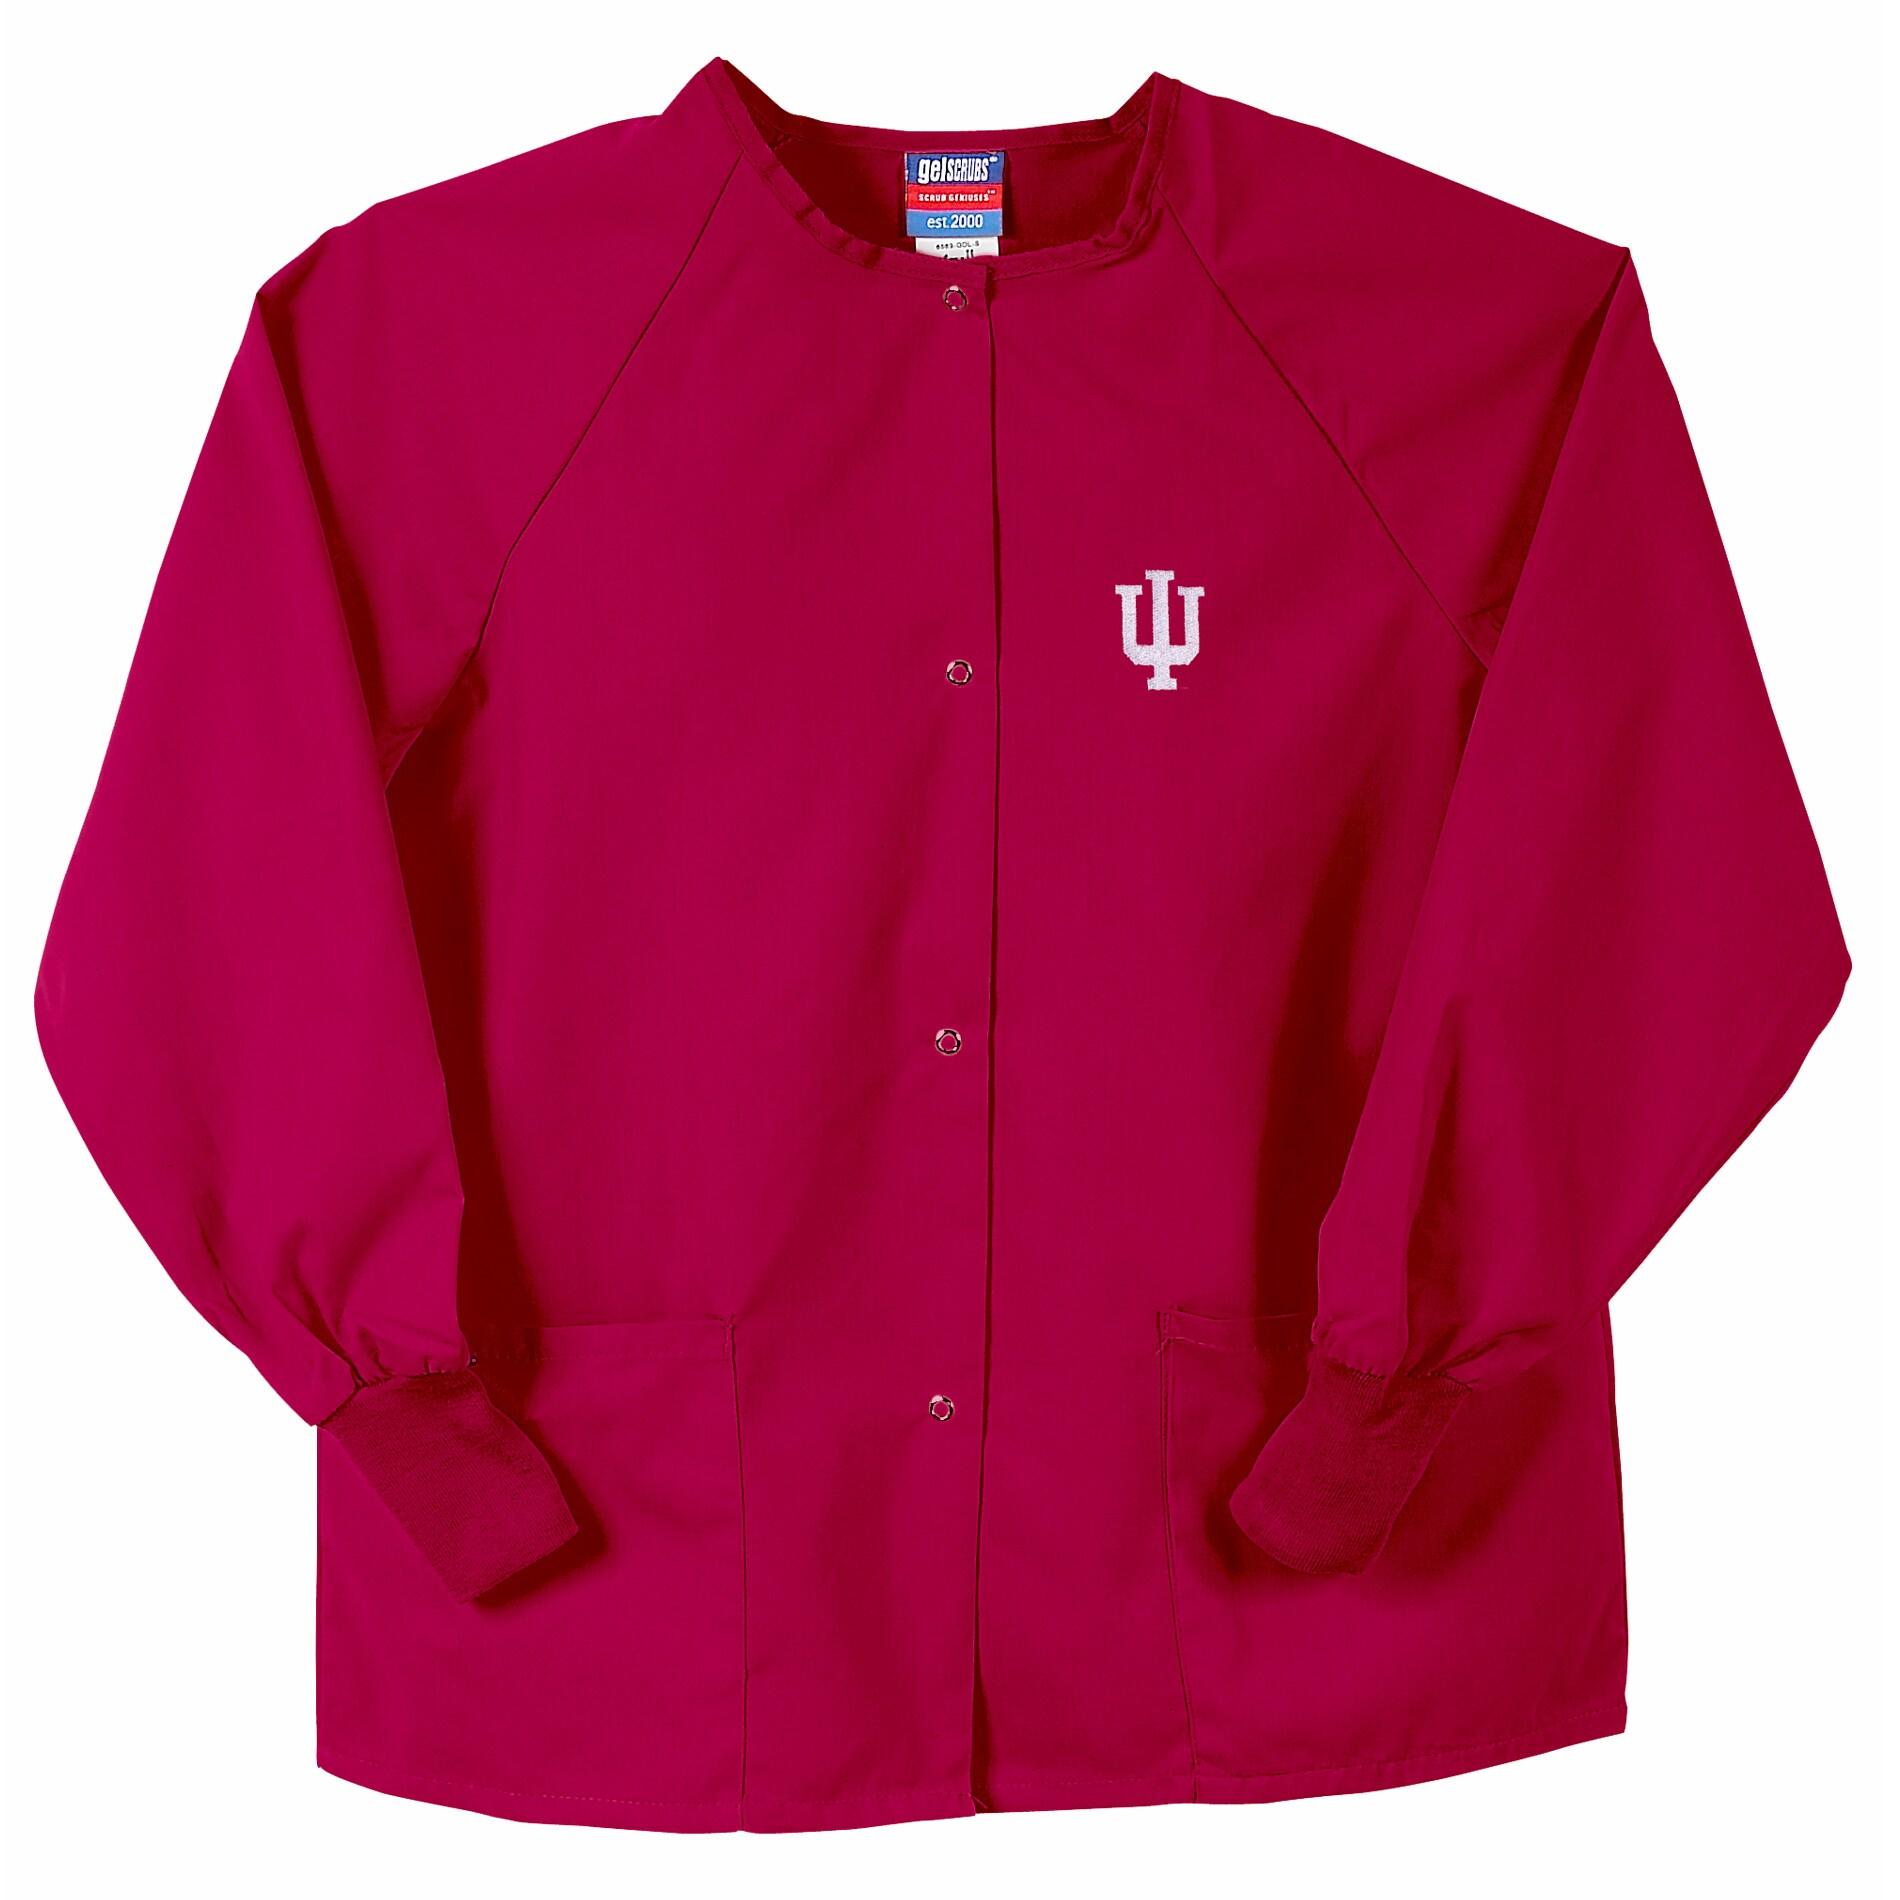 Gelscrubs Unisex Crimson Indiana Hoosiers Nurse Jacket